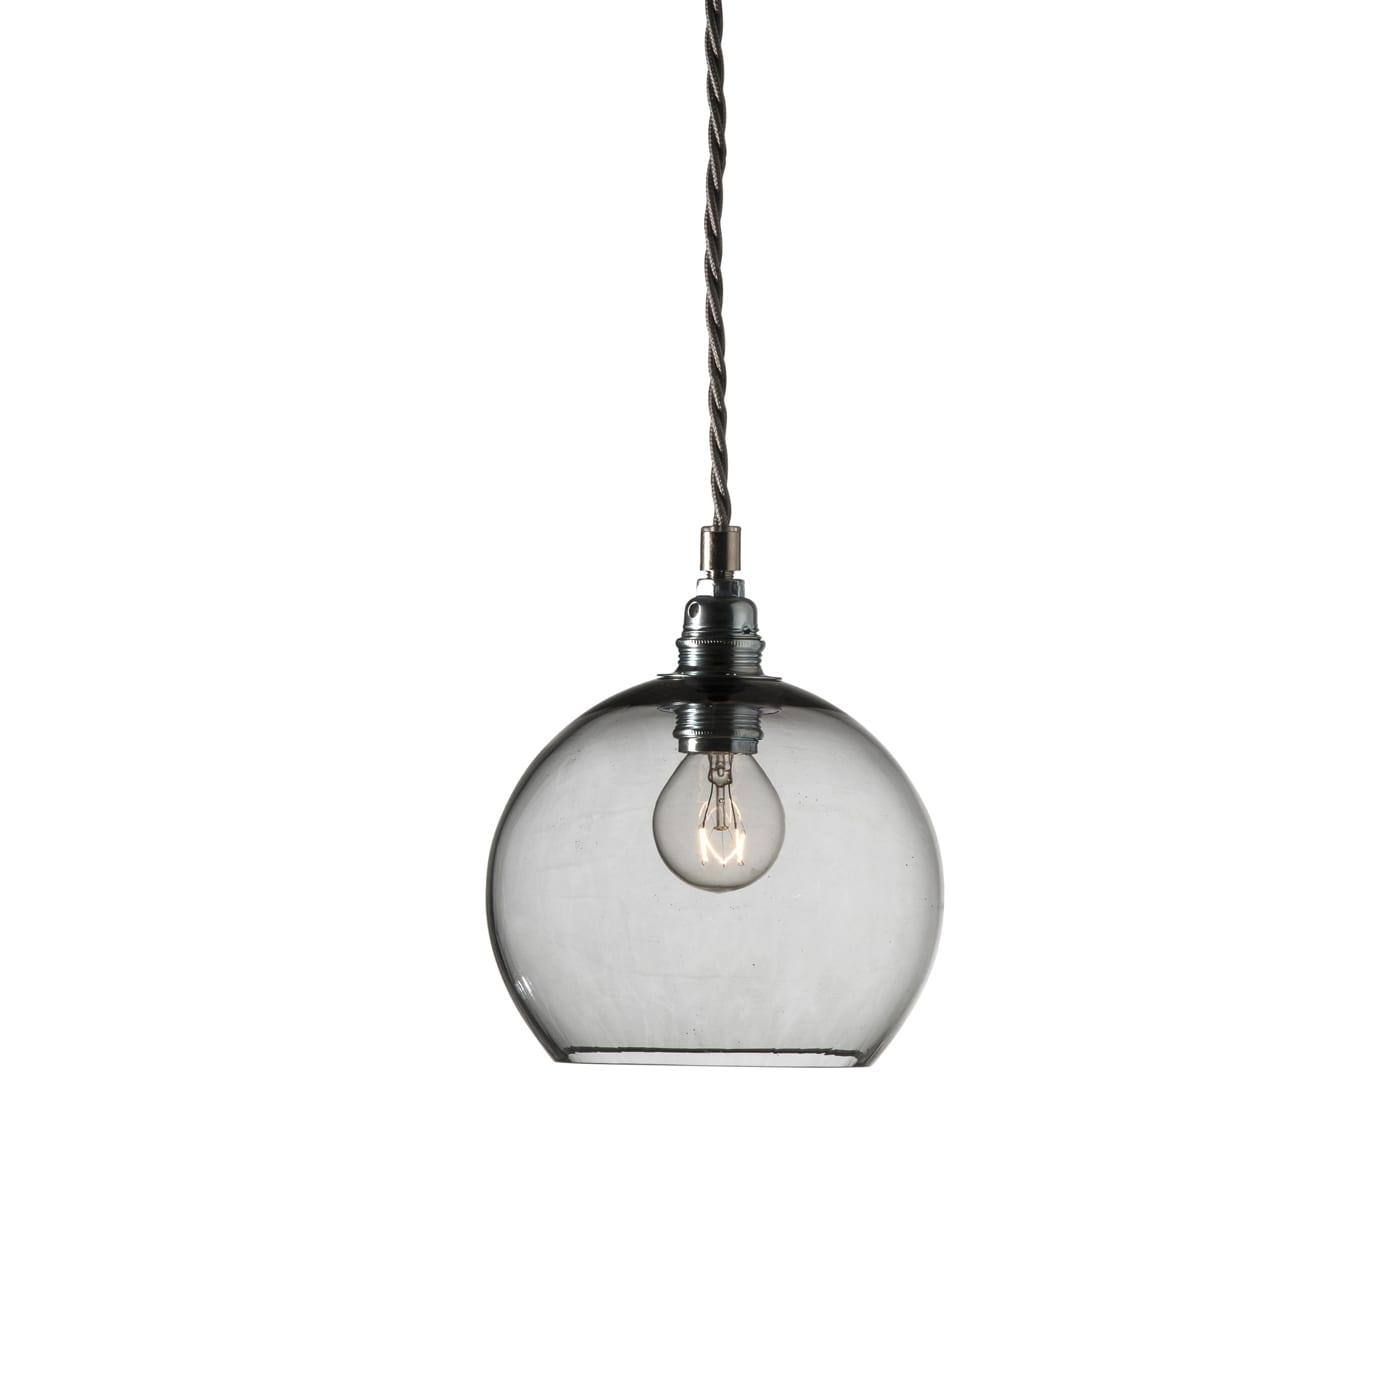 Rowan pendant lamp, smokey grey, 15cm